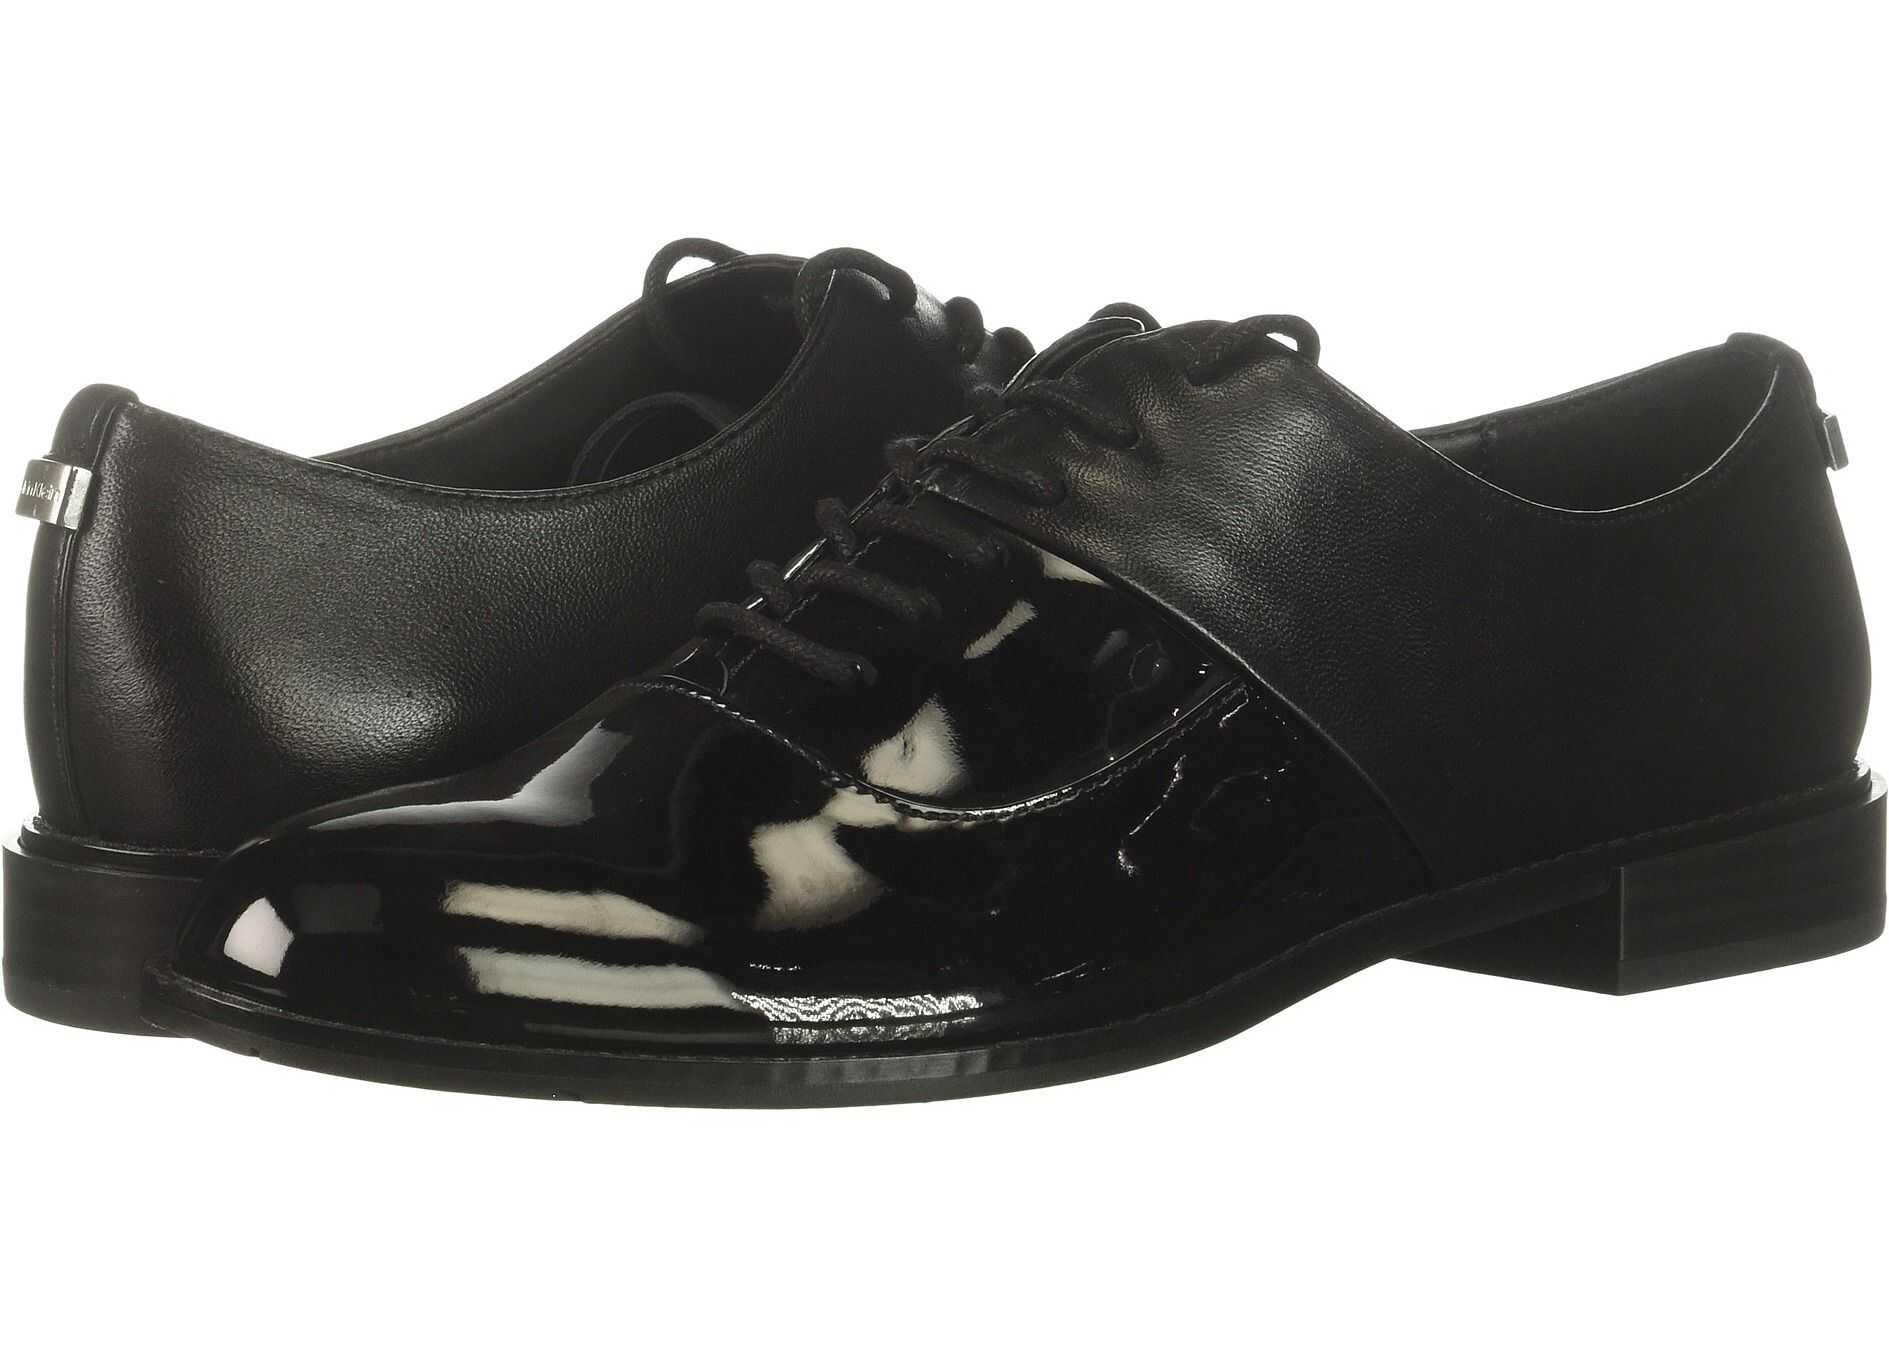 Calvin Klein Aracely Black Patent/Nappa